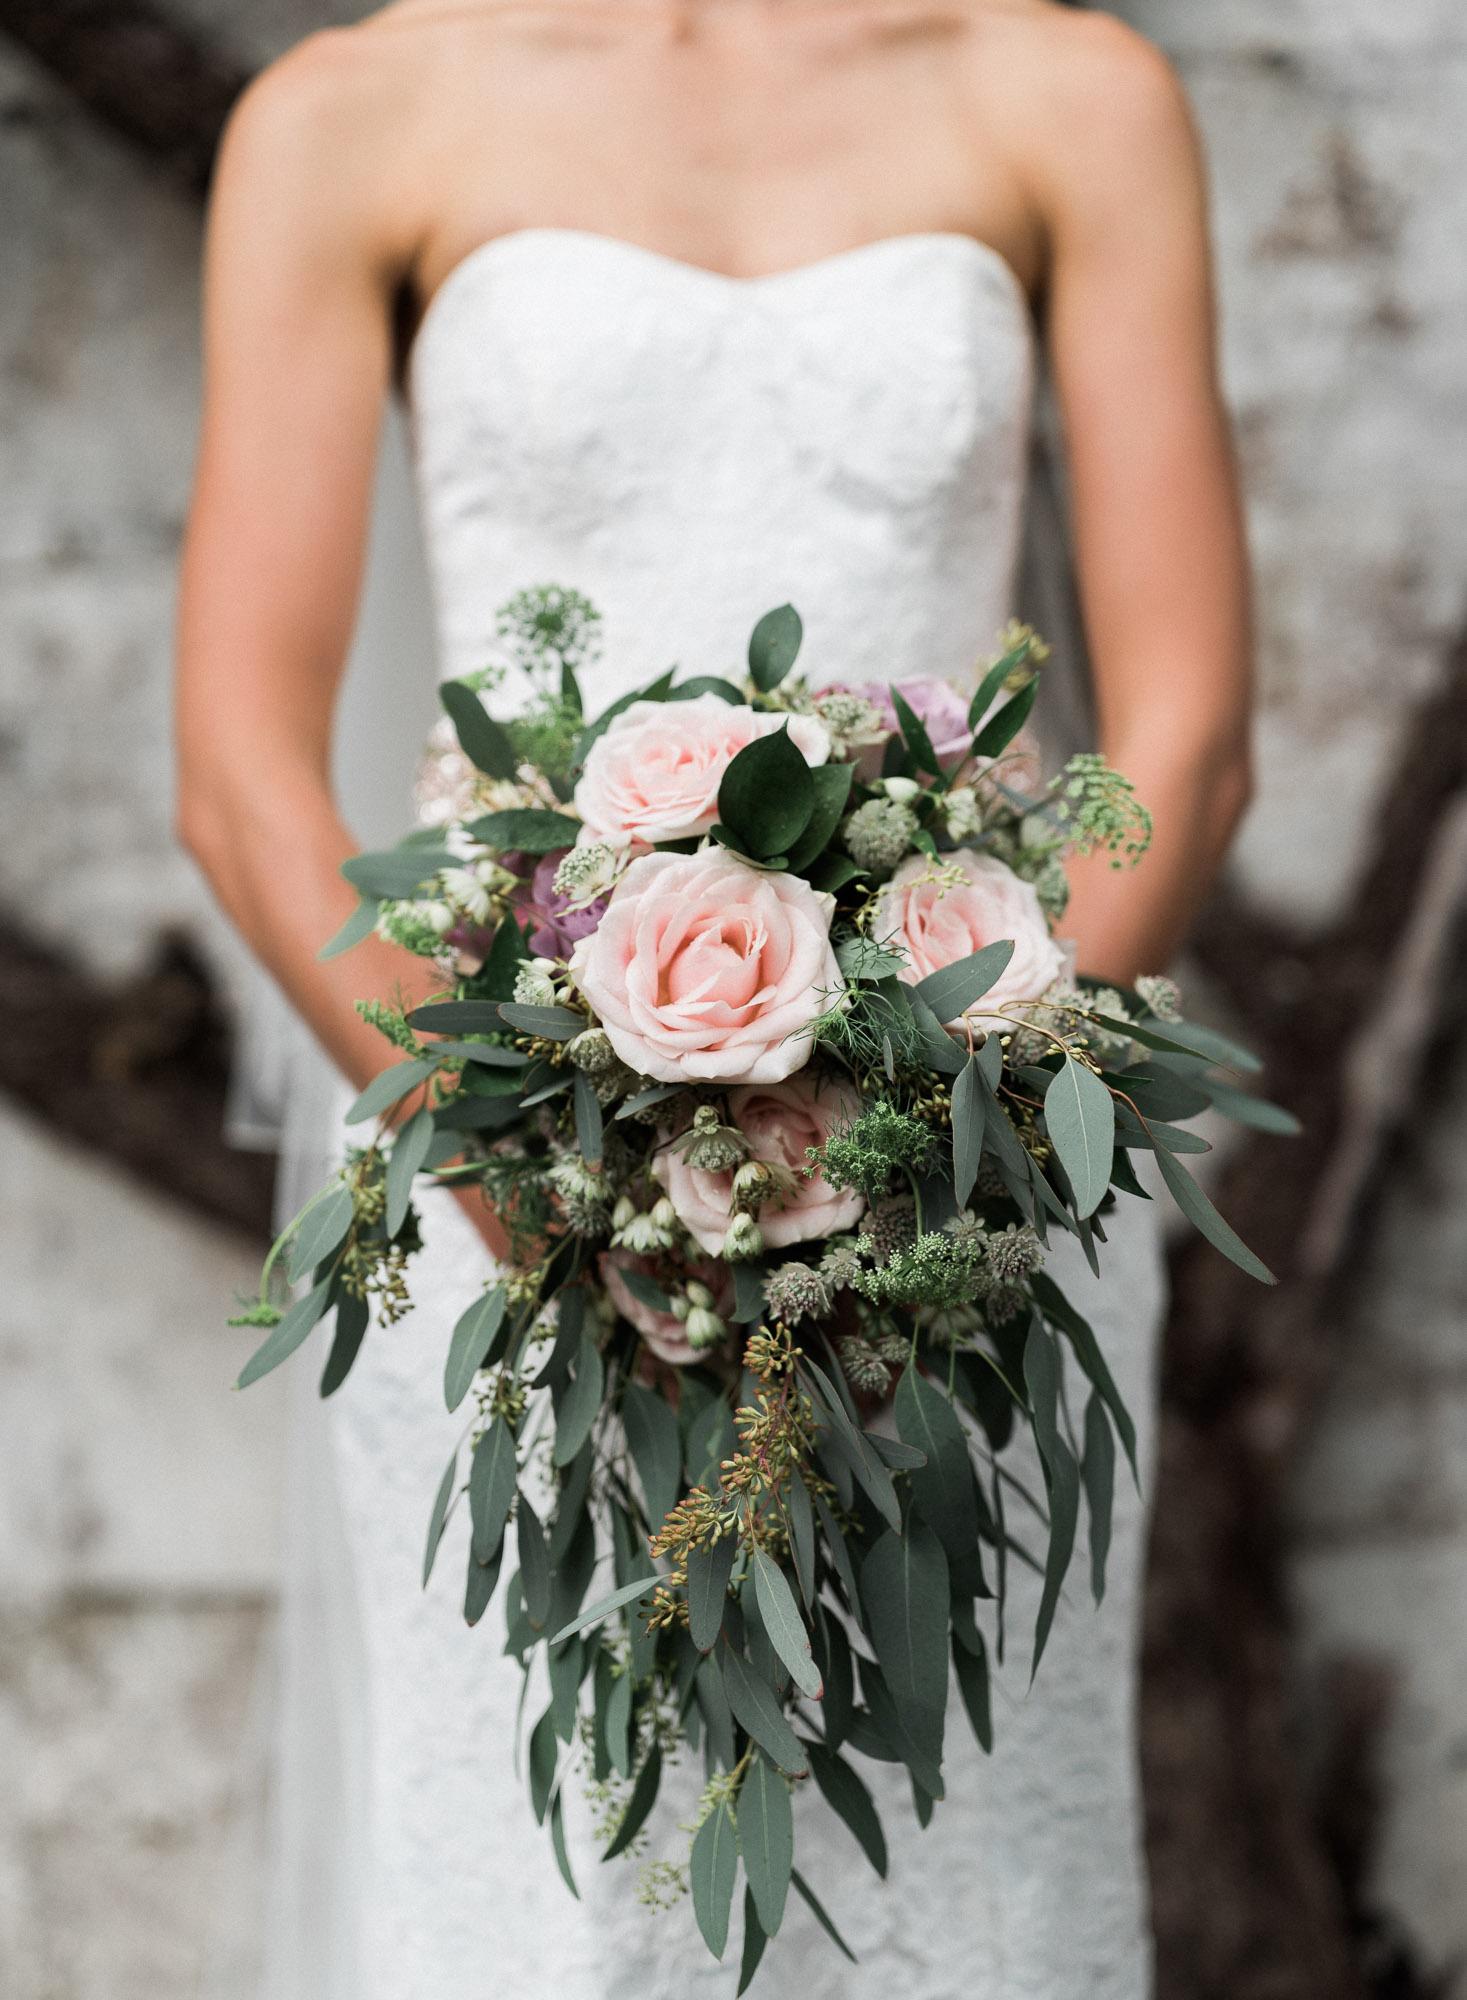 scottish_wedding_blairquhan_castle-53.jpg